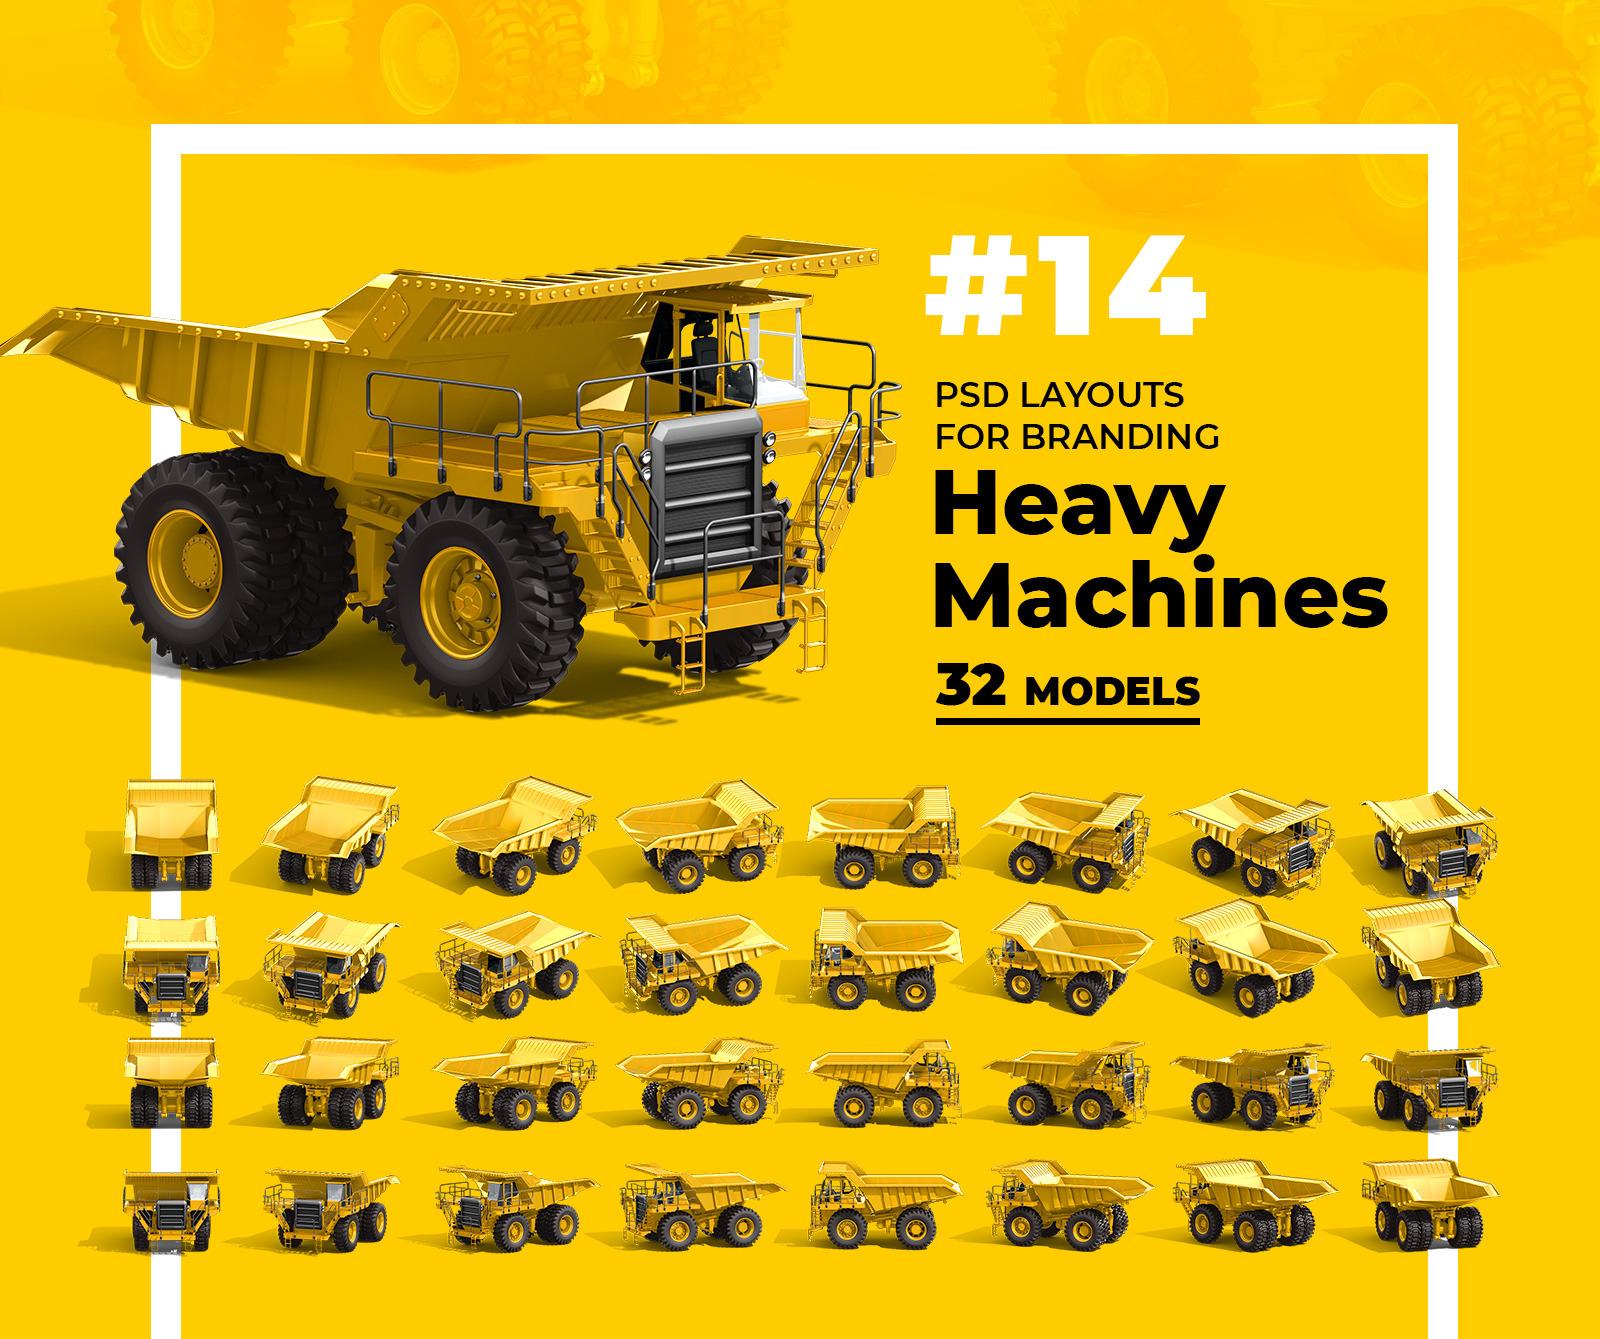 PSD Mockup 3D model Heavy Machines - Off-Highway Truck #14